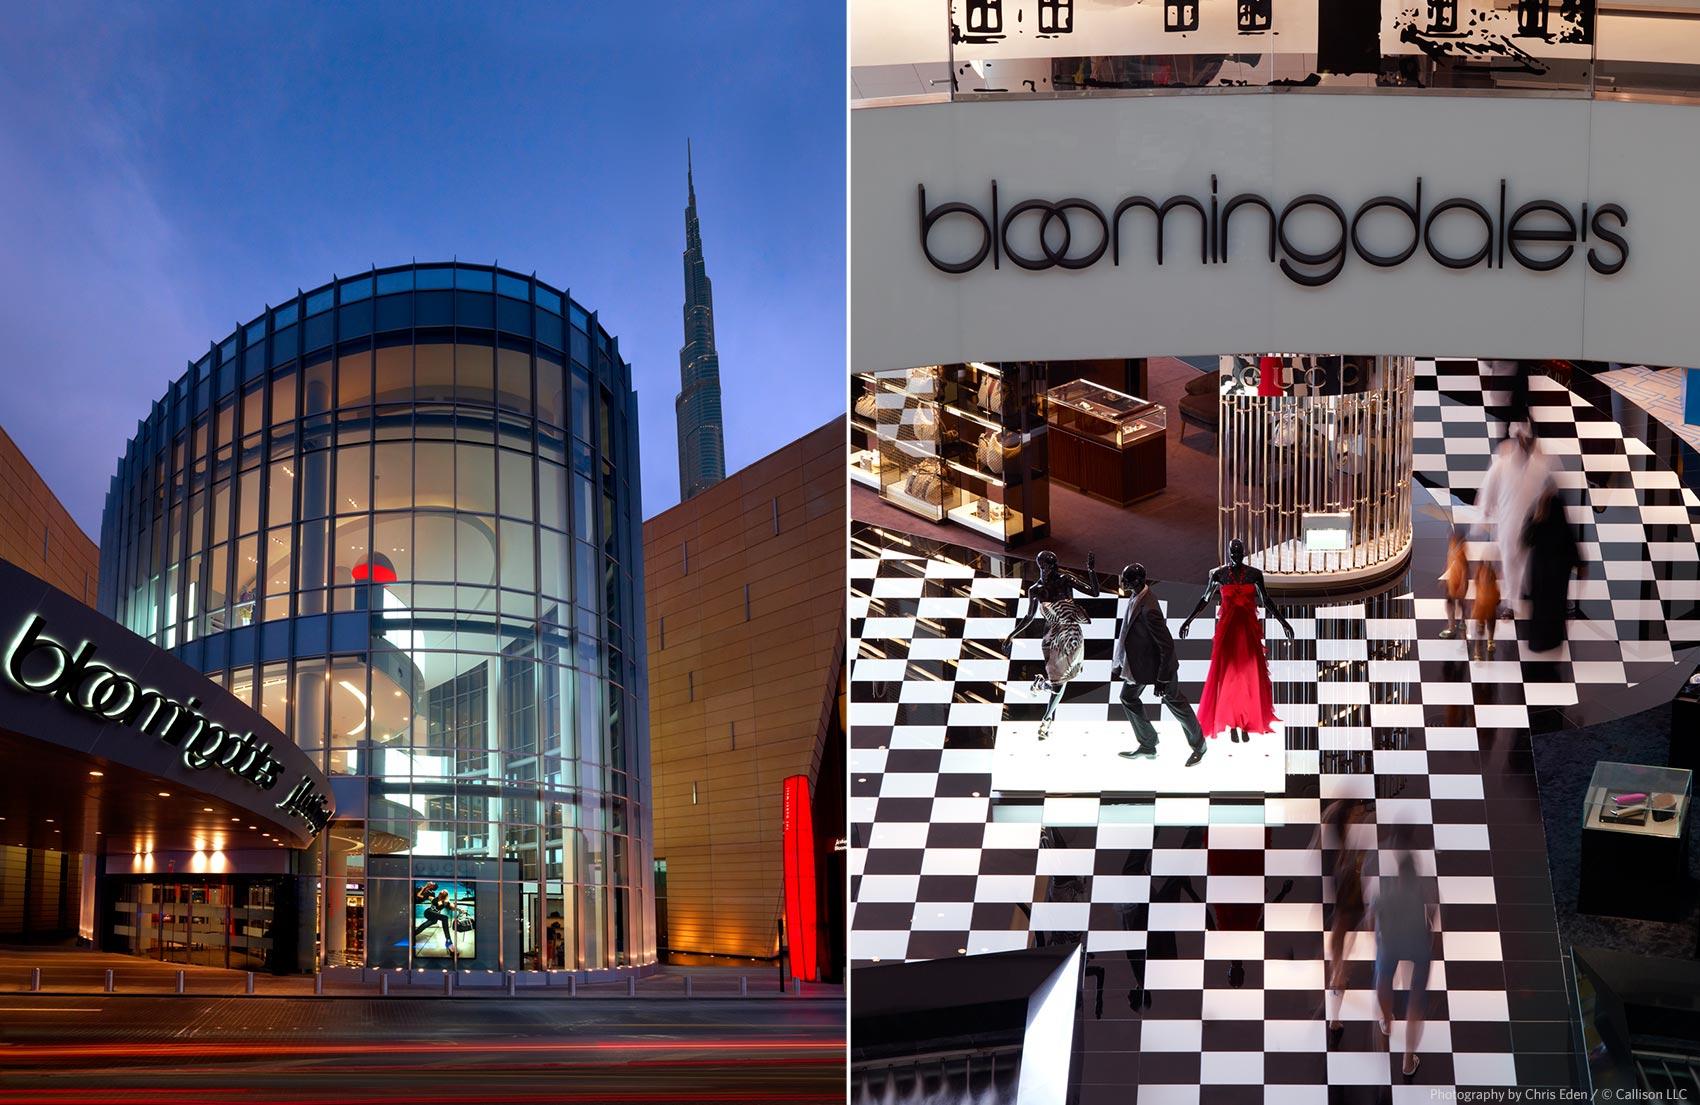 Bloomingdales - Dubai - Exterior and Mall interior key vantage points